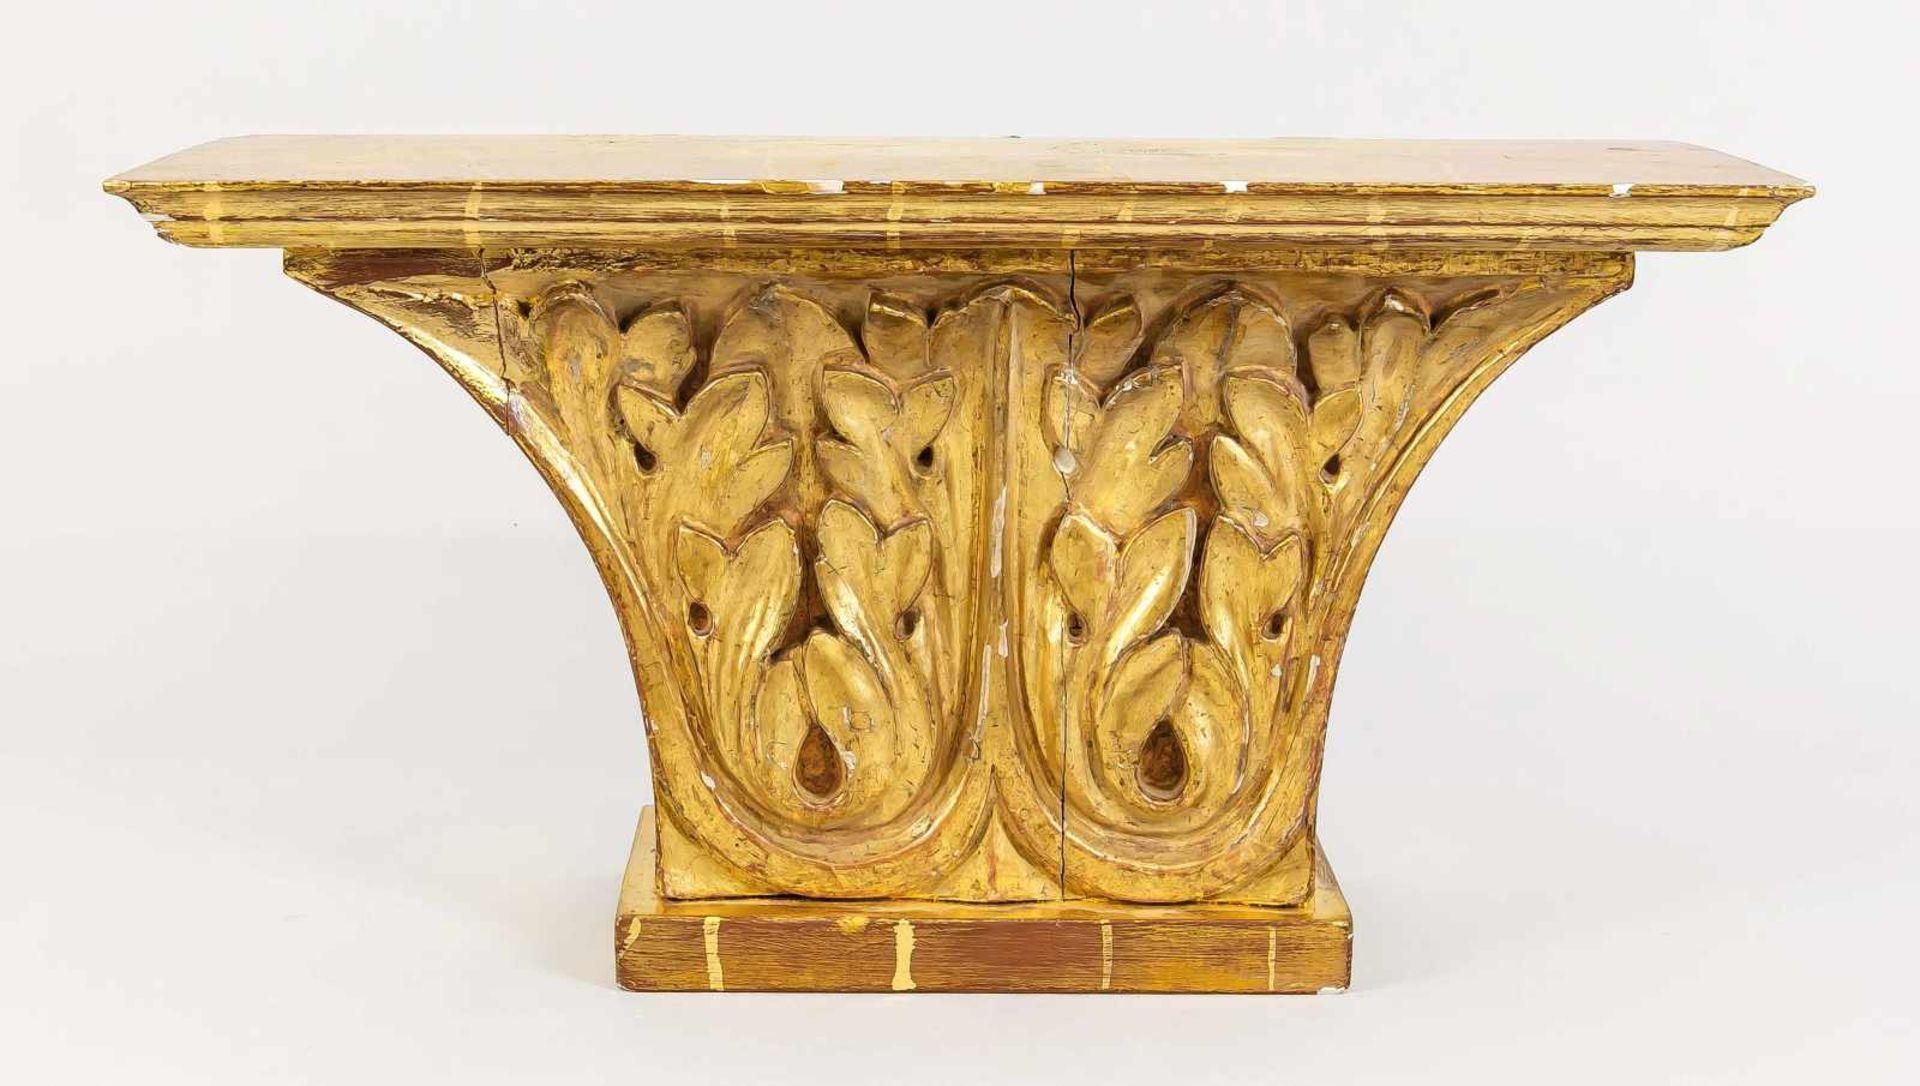 Wandkonsole/Kapitell, 19. Jh., Holz, massivholz, vergoldet. Die Front mit Akanthusrelief